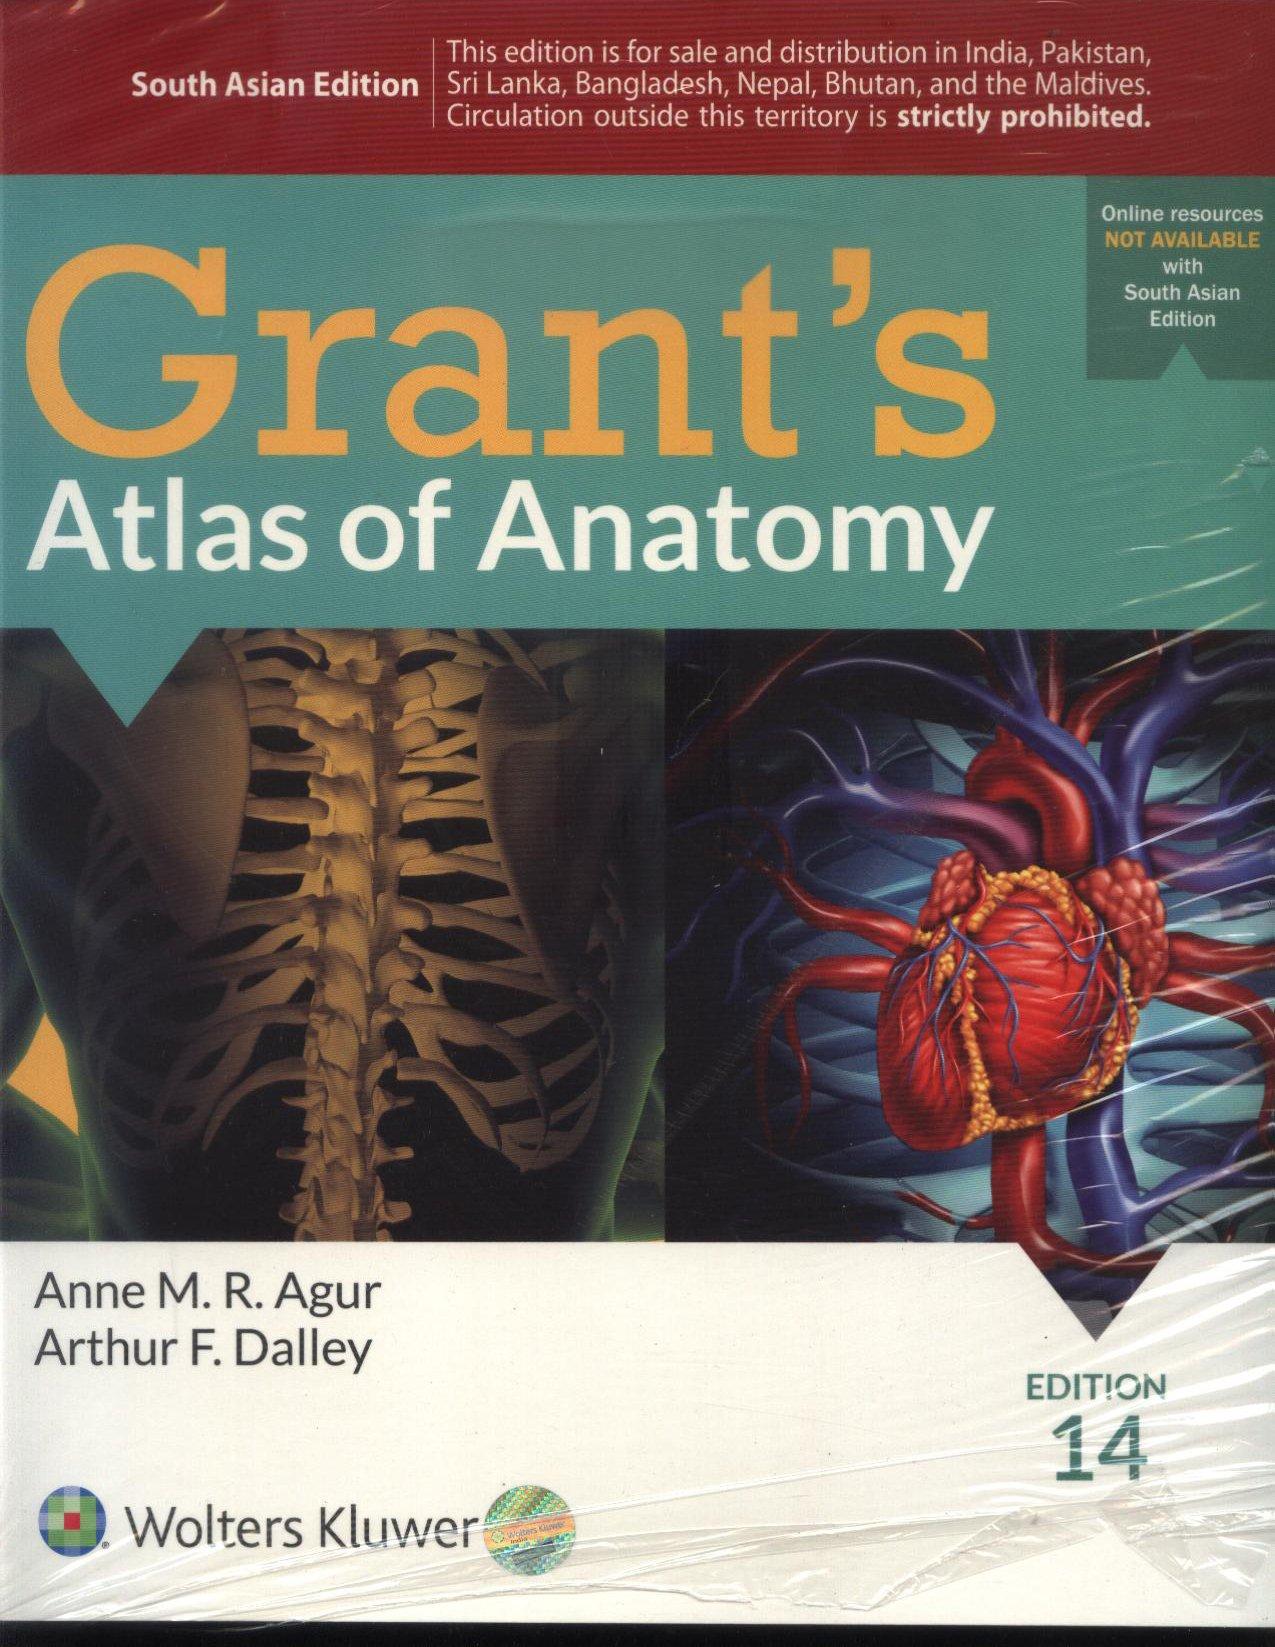 Grants Atlas Of Anatomy 14Ed (Pb 2017): Agur Dalley: 9789351296065 ...